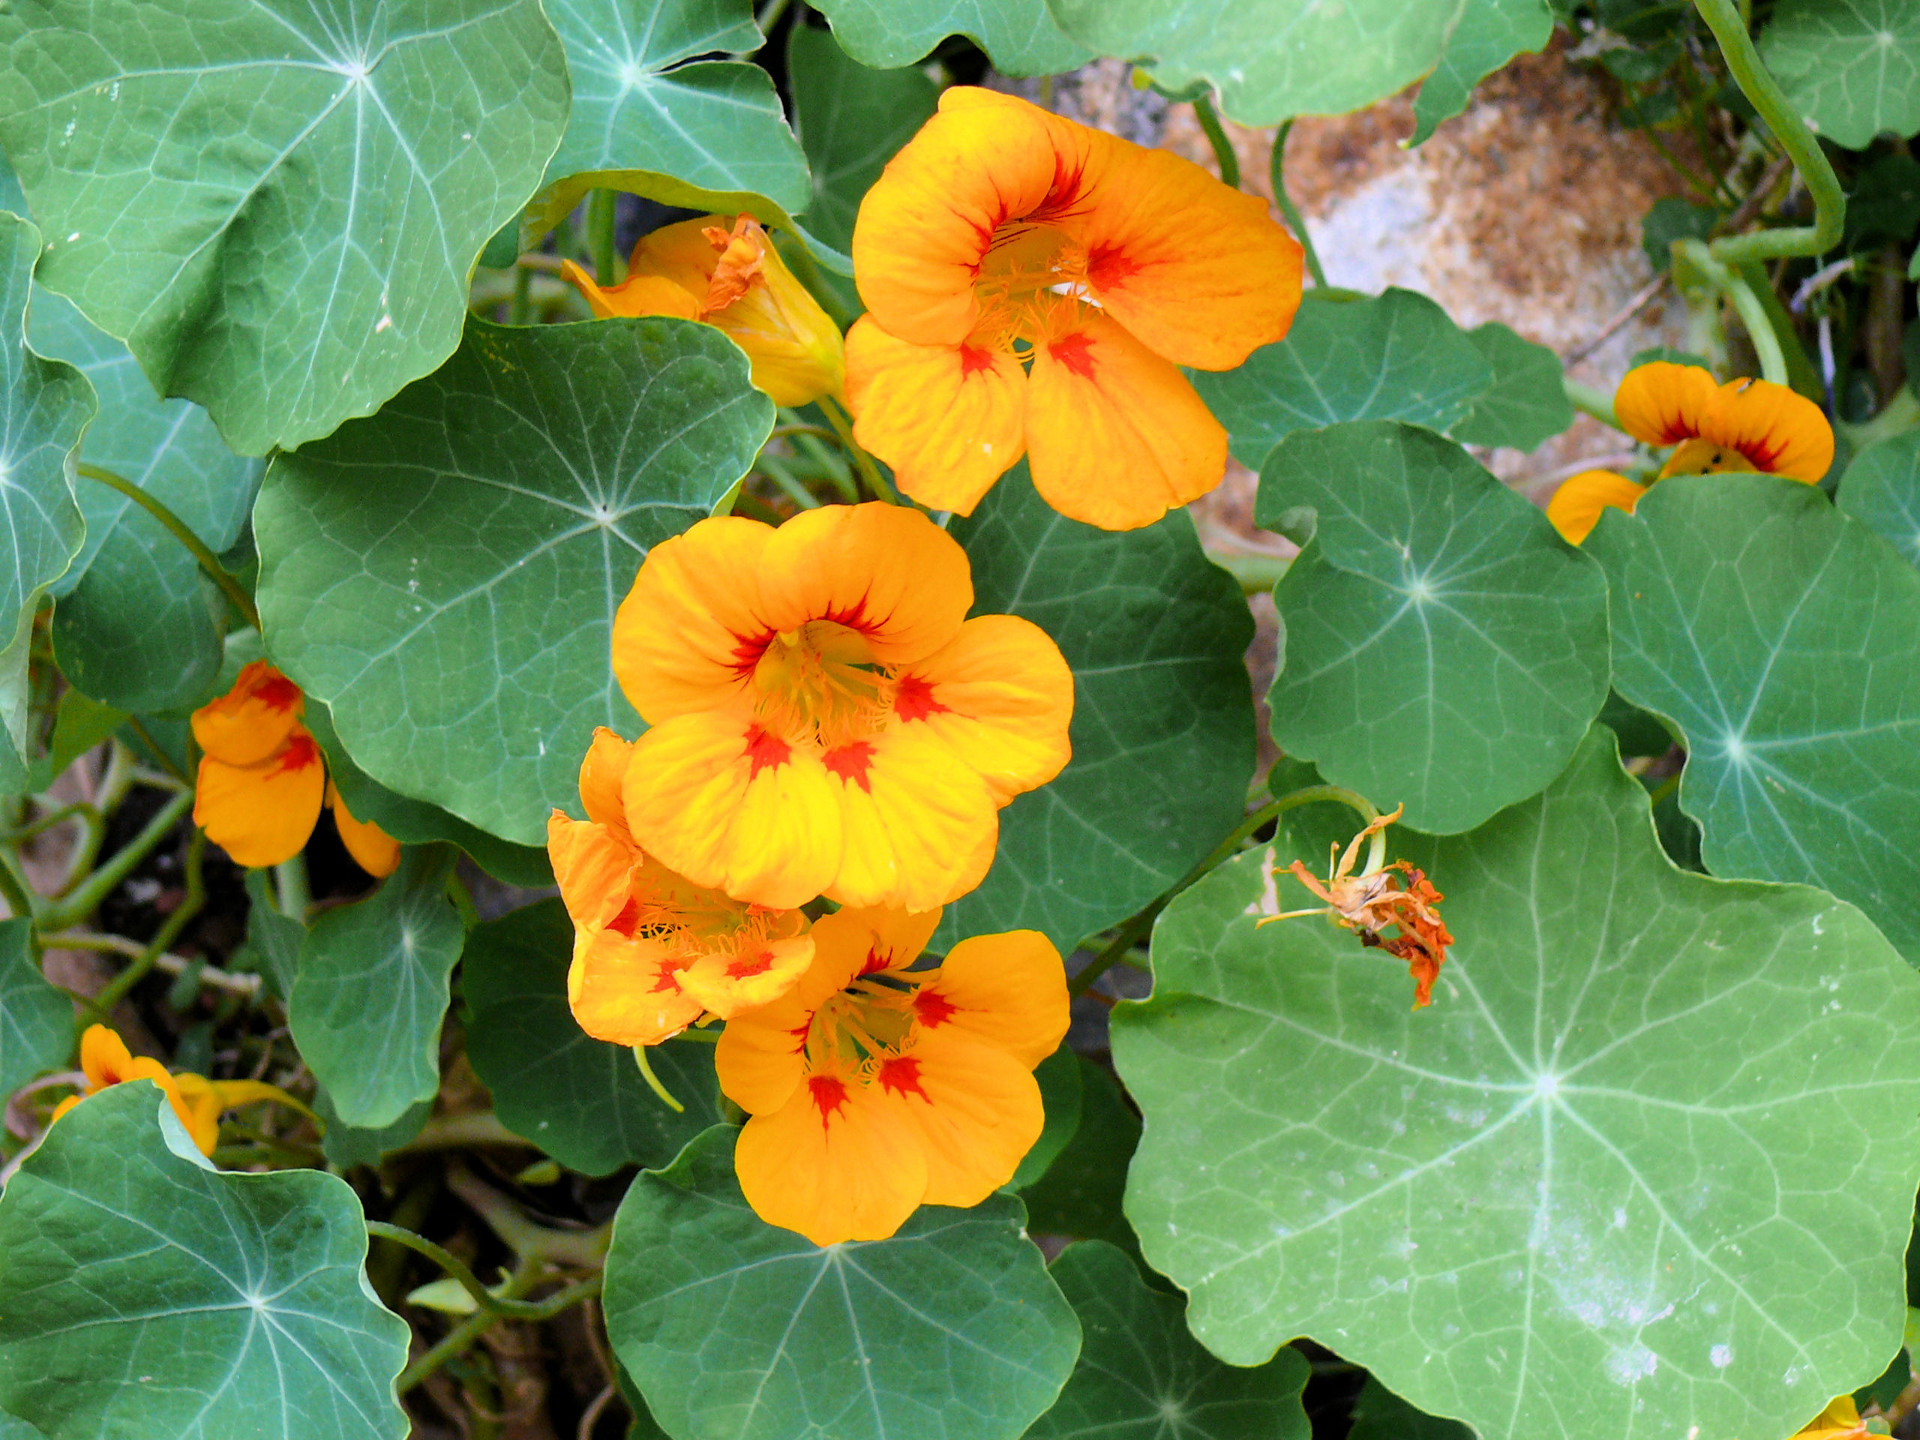 fleurs-comestibles-capucines-terrasse-balcon